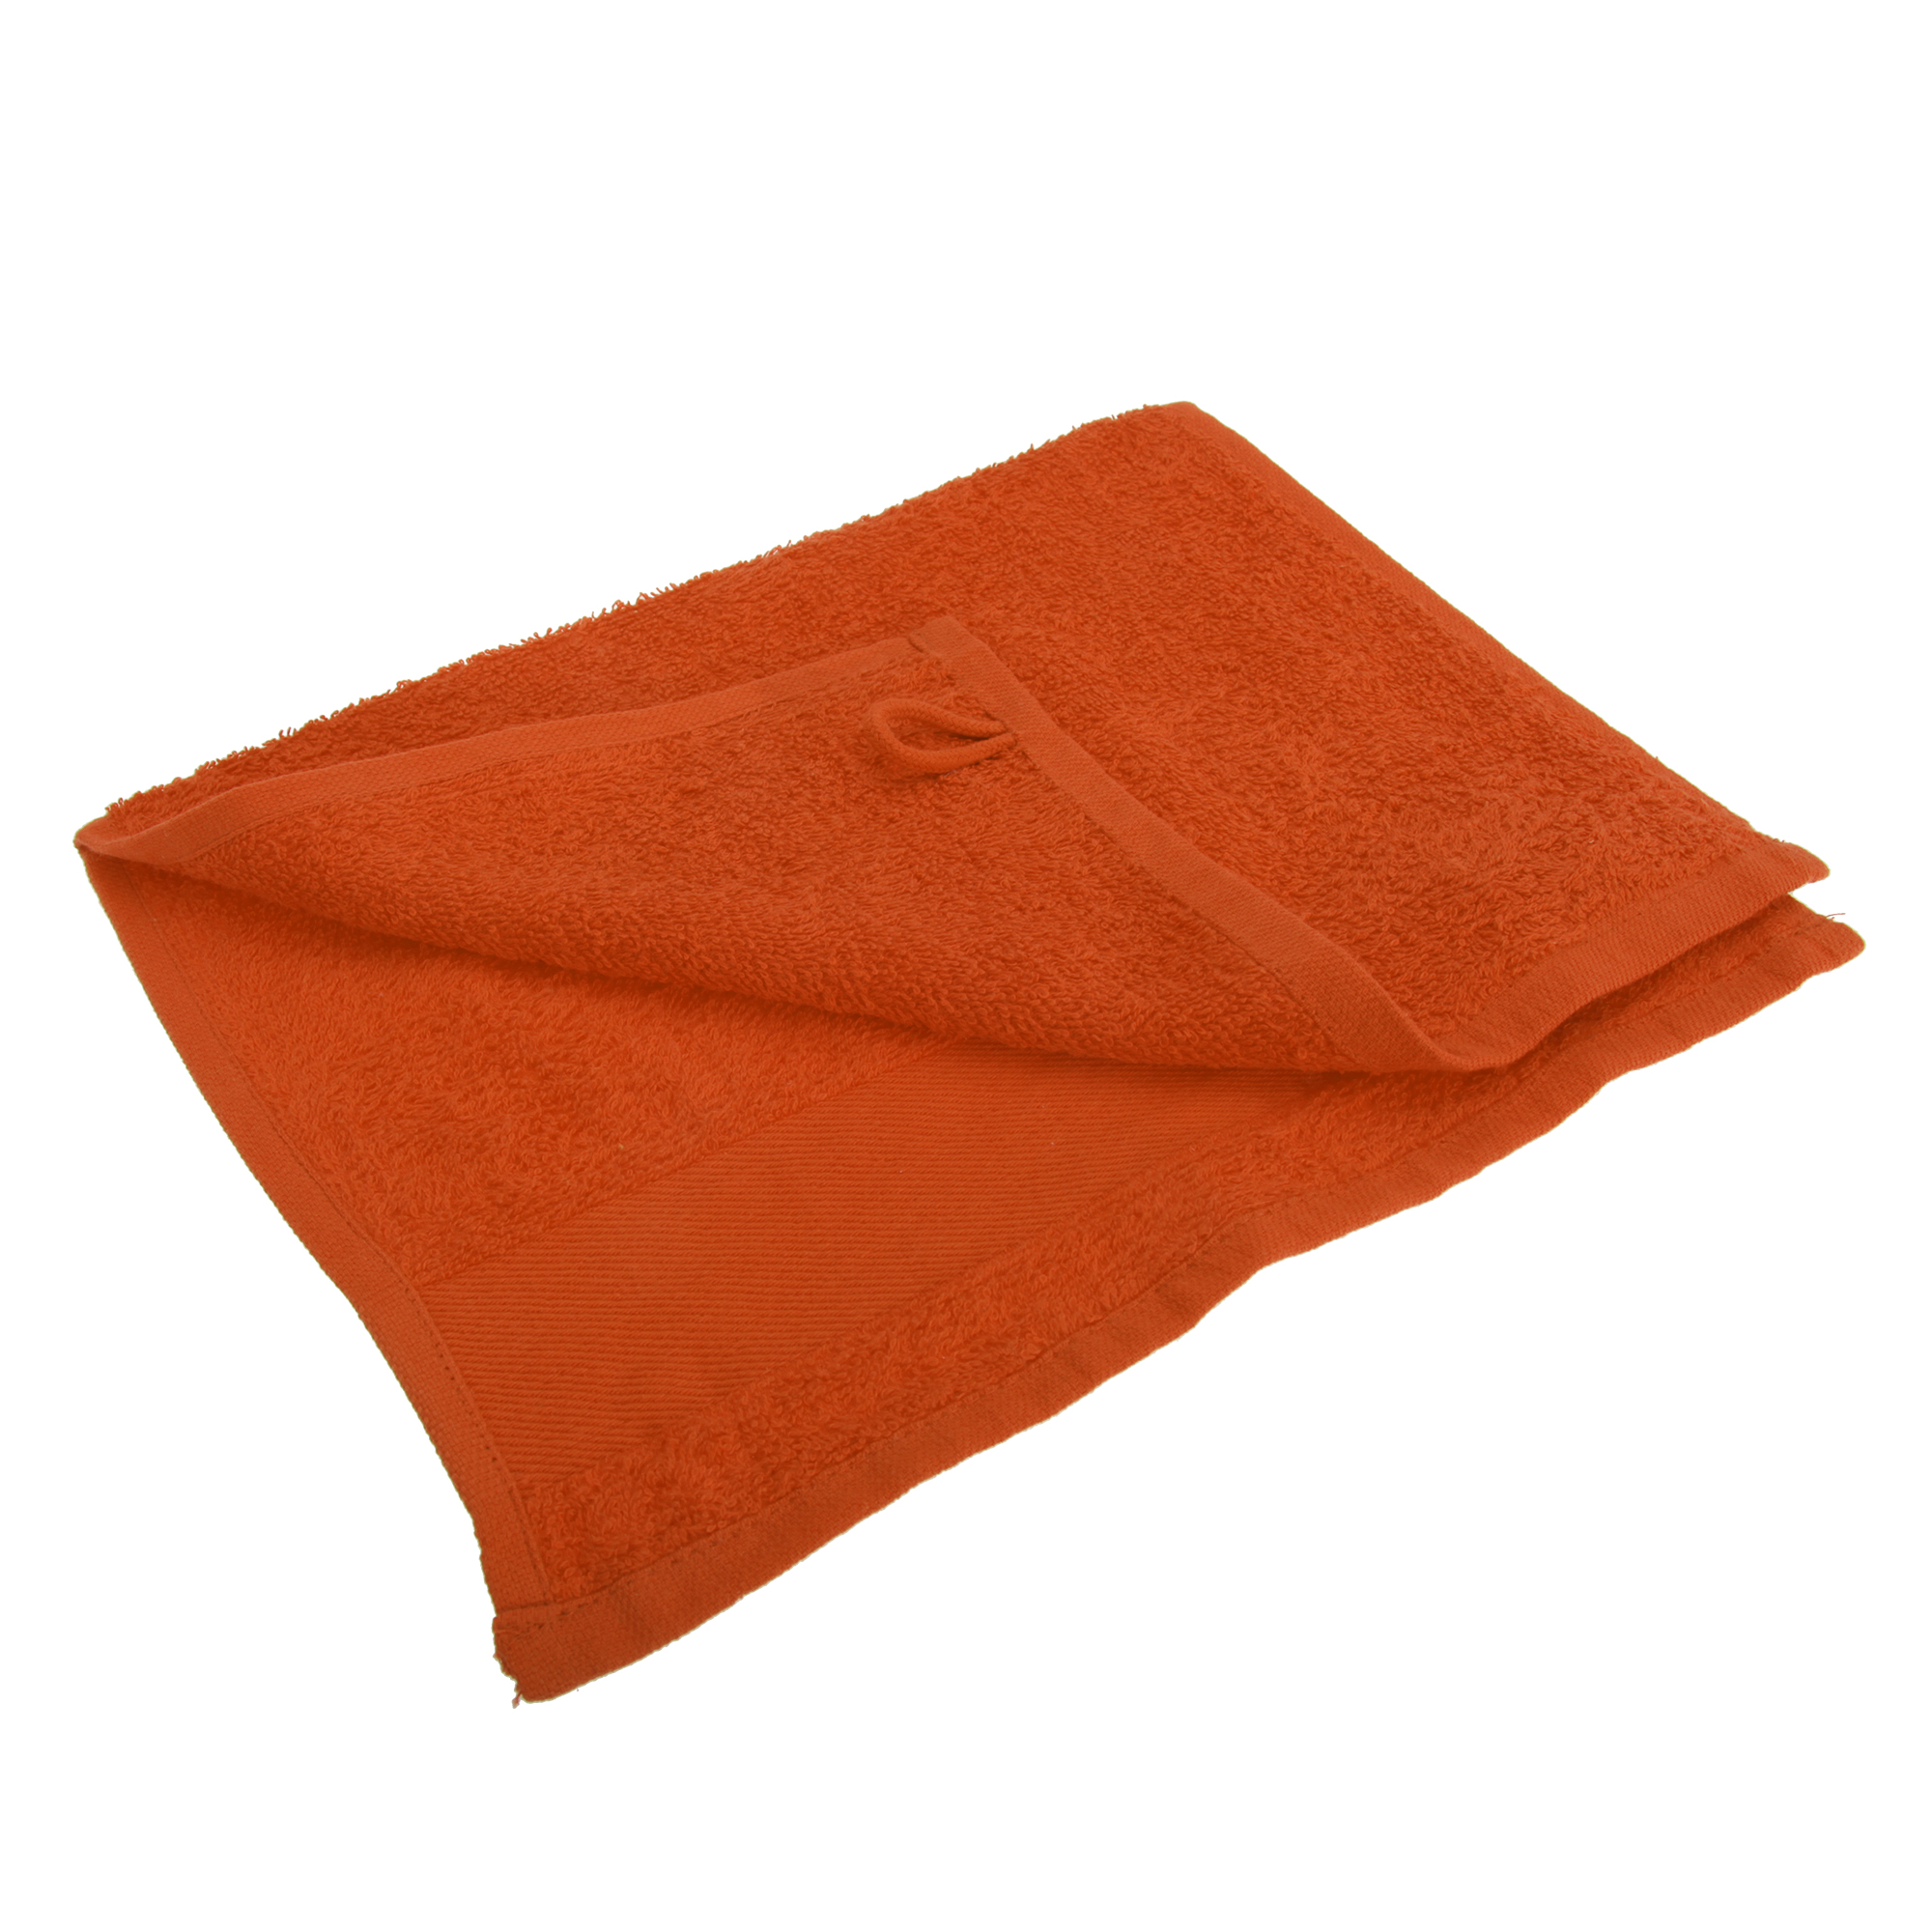 Sols island 100 cotton bathroom guest hand towel 11 x 20 for Bathroom hand towels